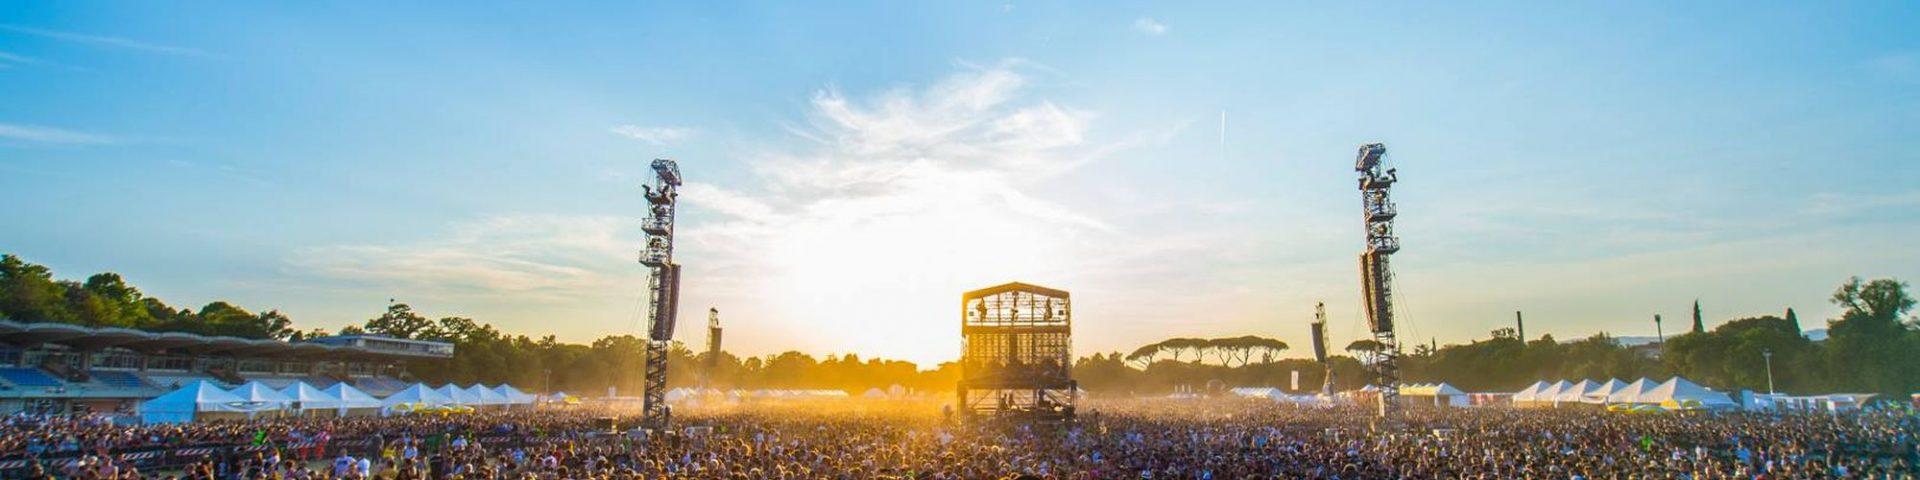 Firenze Rocks a Firenze – 14 giugno: biglietti, scaletta, ospiti, come arrivare